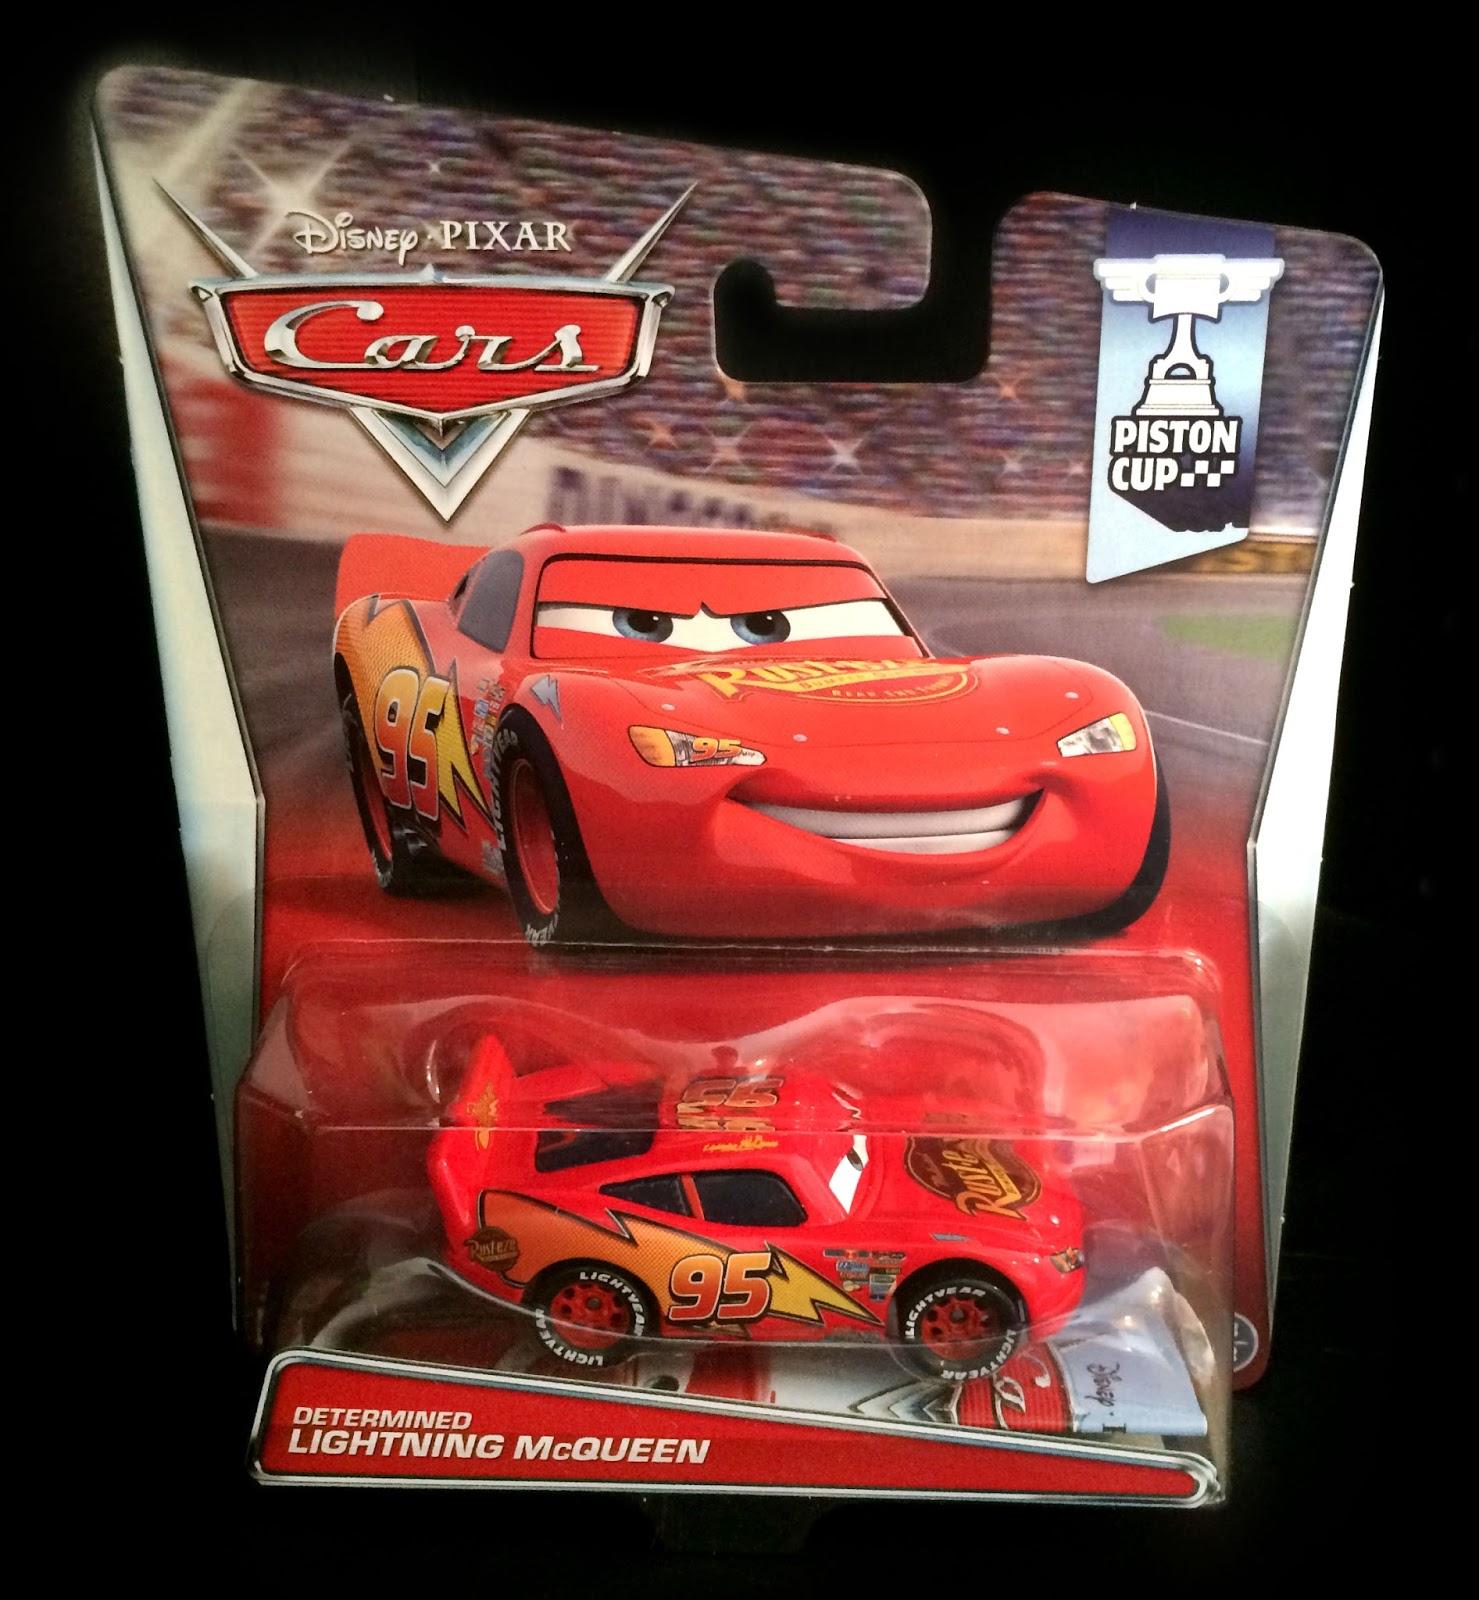 Dan The Pixar Fan Cars Determined Lightning Mcqueen